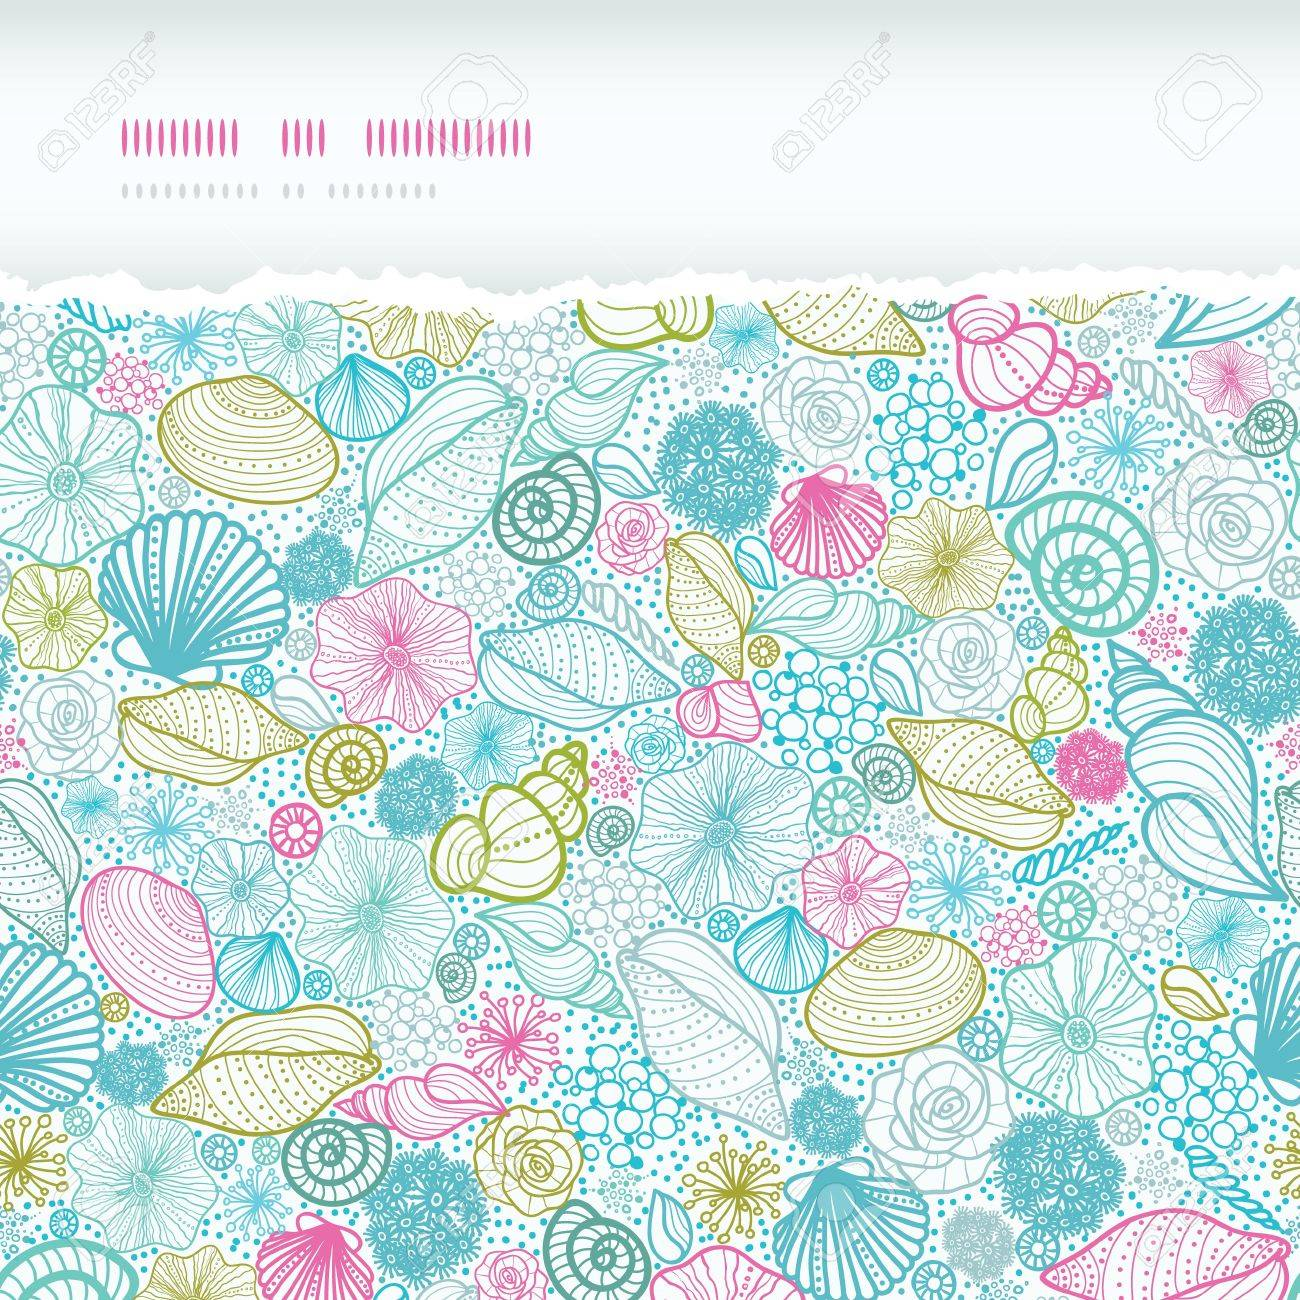 Seashells line art horizontal torn seamless pattern background Stock Vector - 18433367